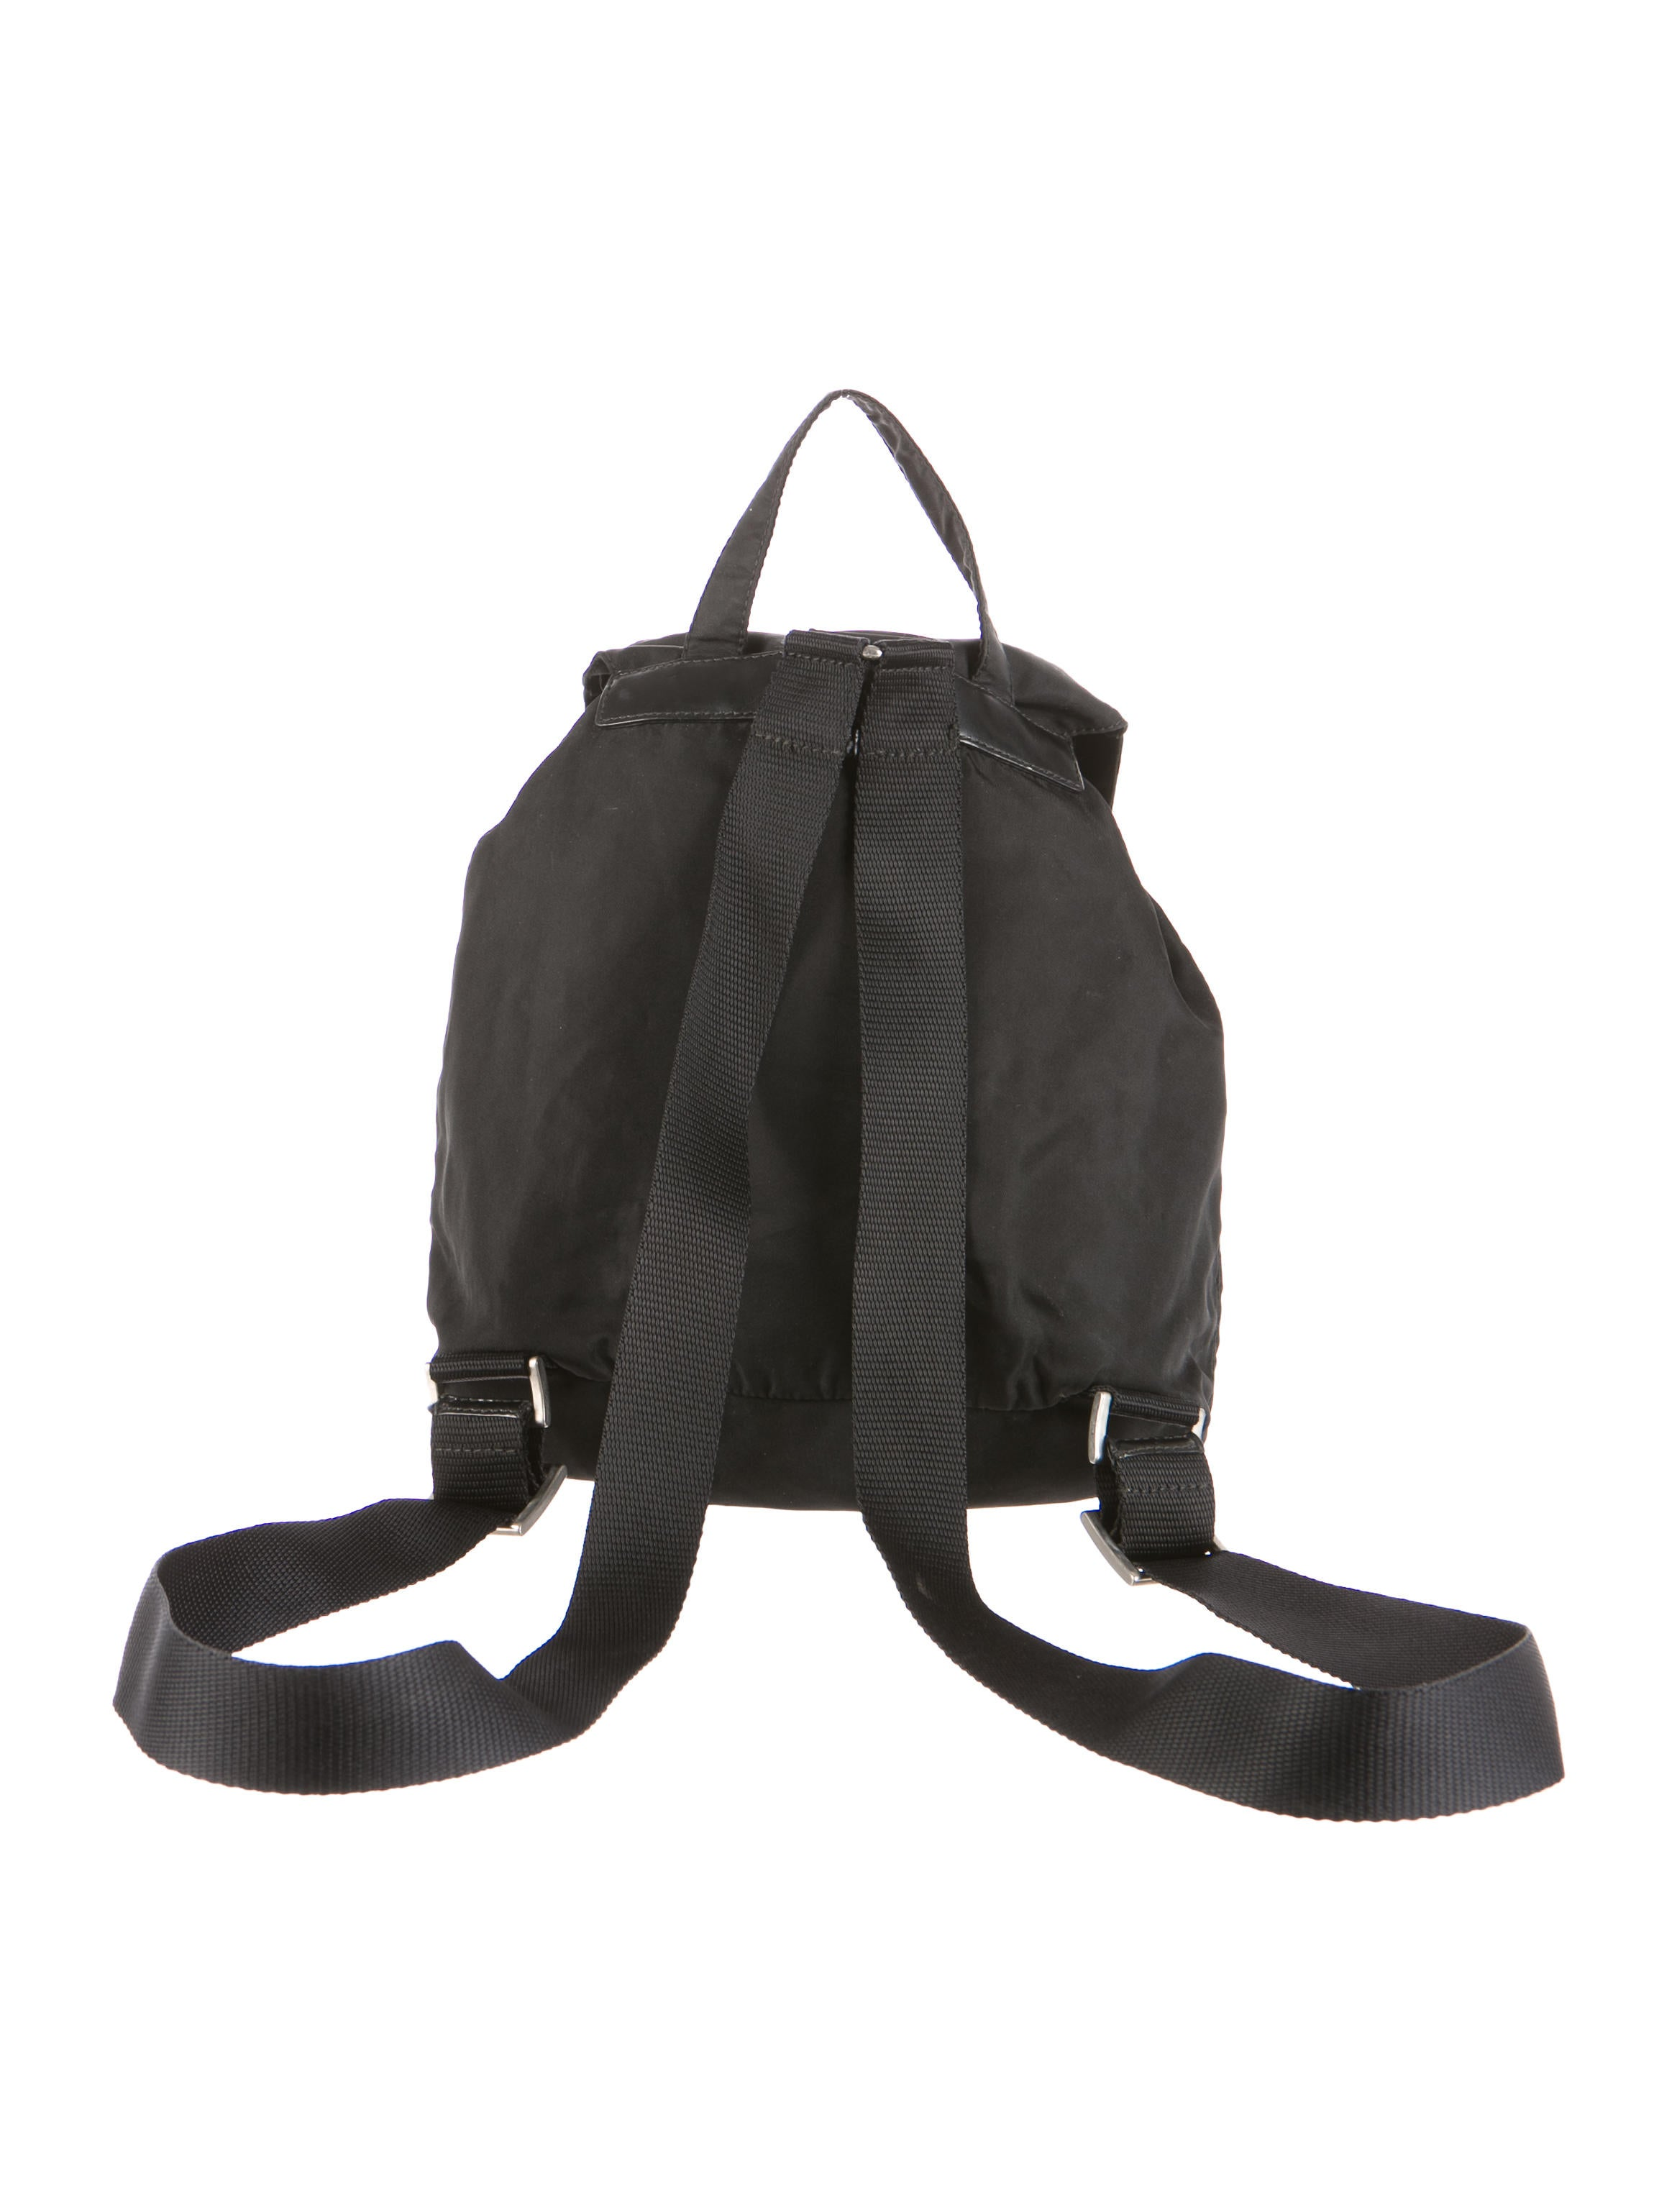 prada shoulder bag - prada leather-trimmed tessuto backpack, brown leather zip around purse